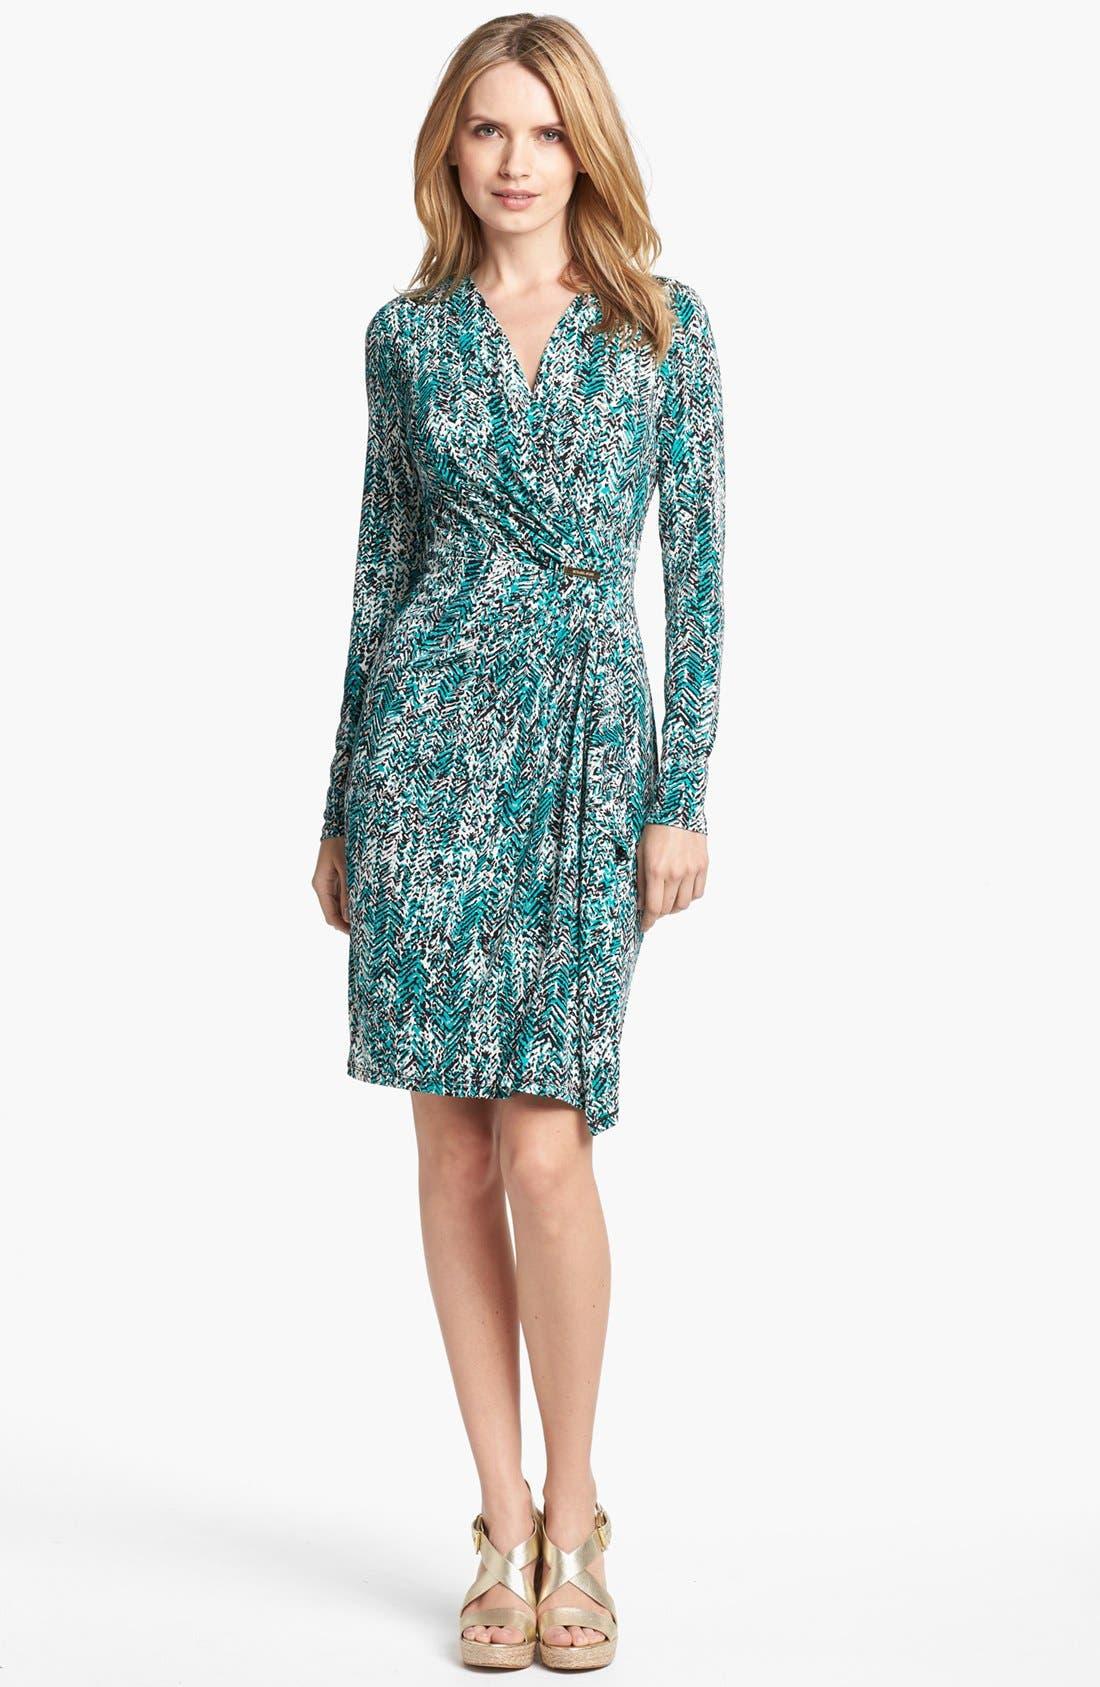 Alternate Image 1 Selected - MICHAEL Michael Kors Print Faux Wrap Dress (Petite)